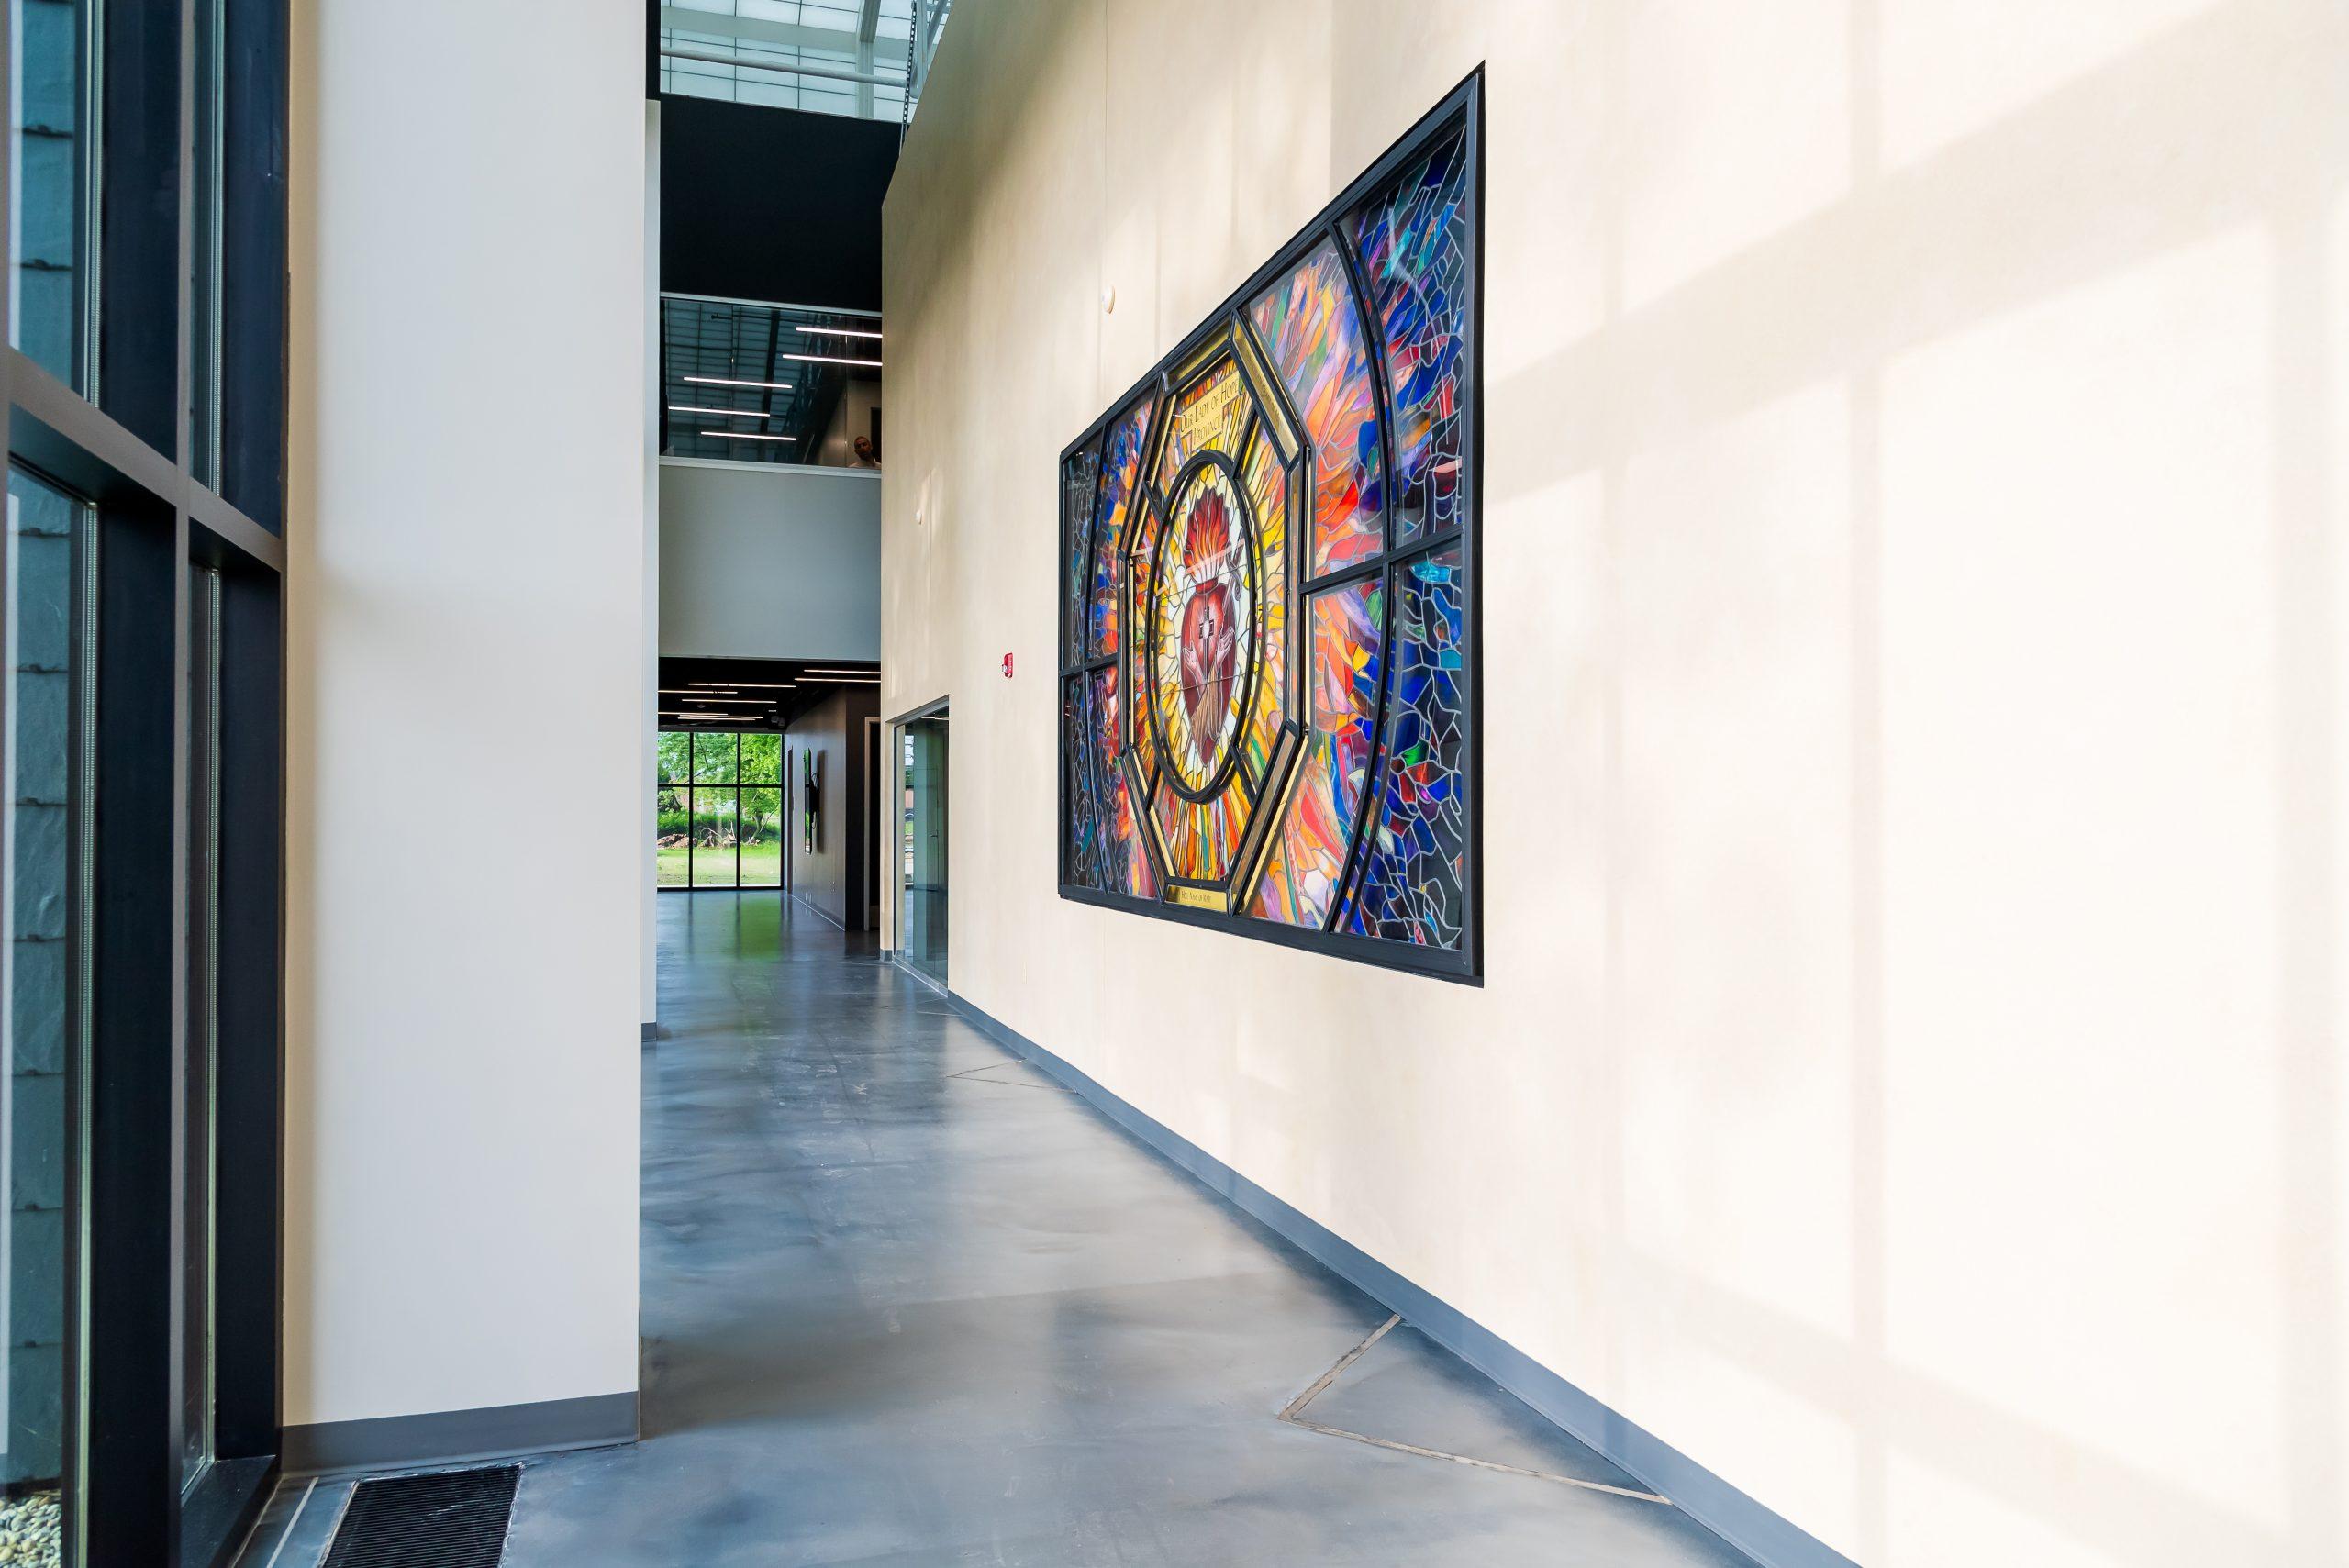 Hallway with stained glass window